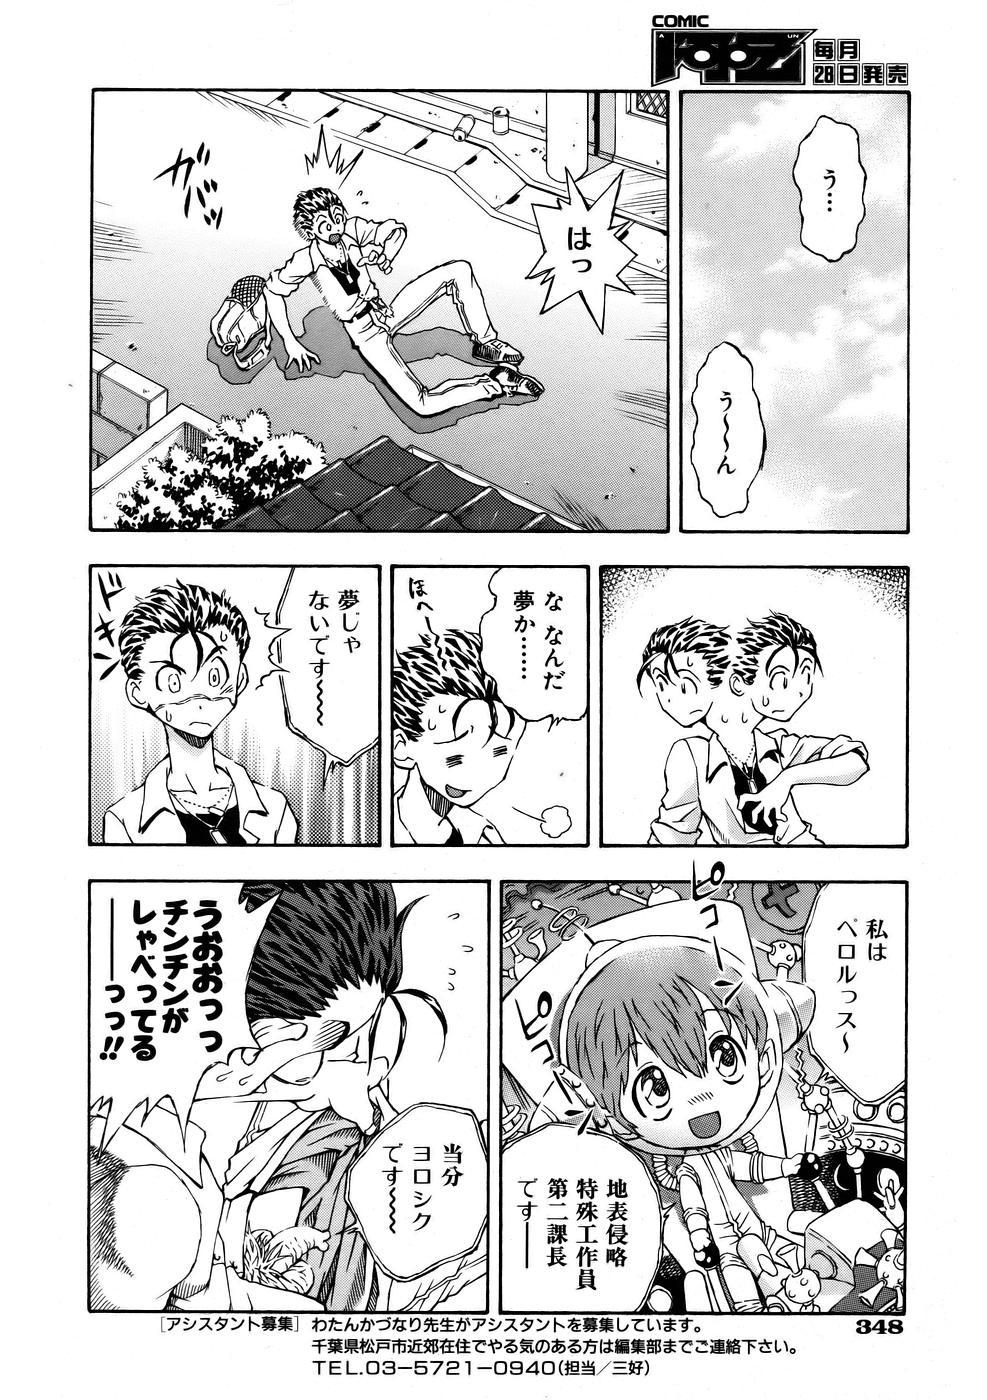 COMIC AUN 2005-10 Vol. 113 345